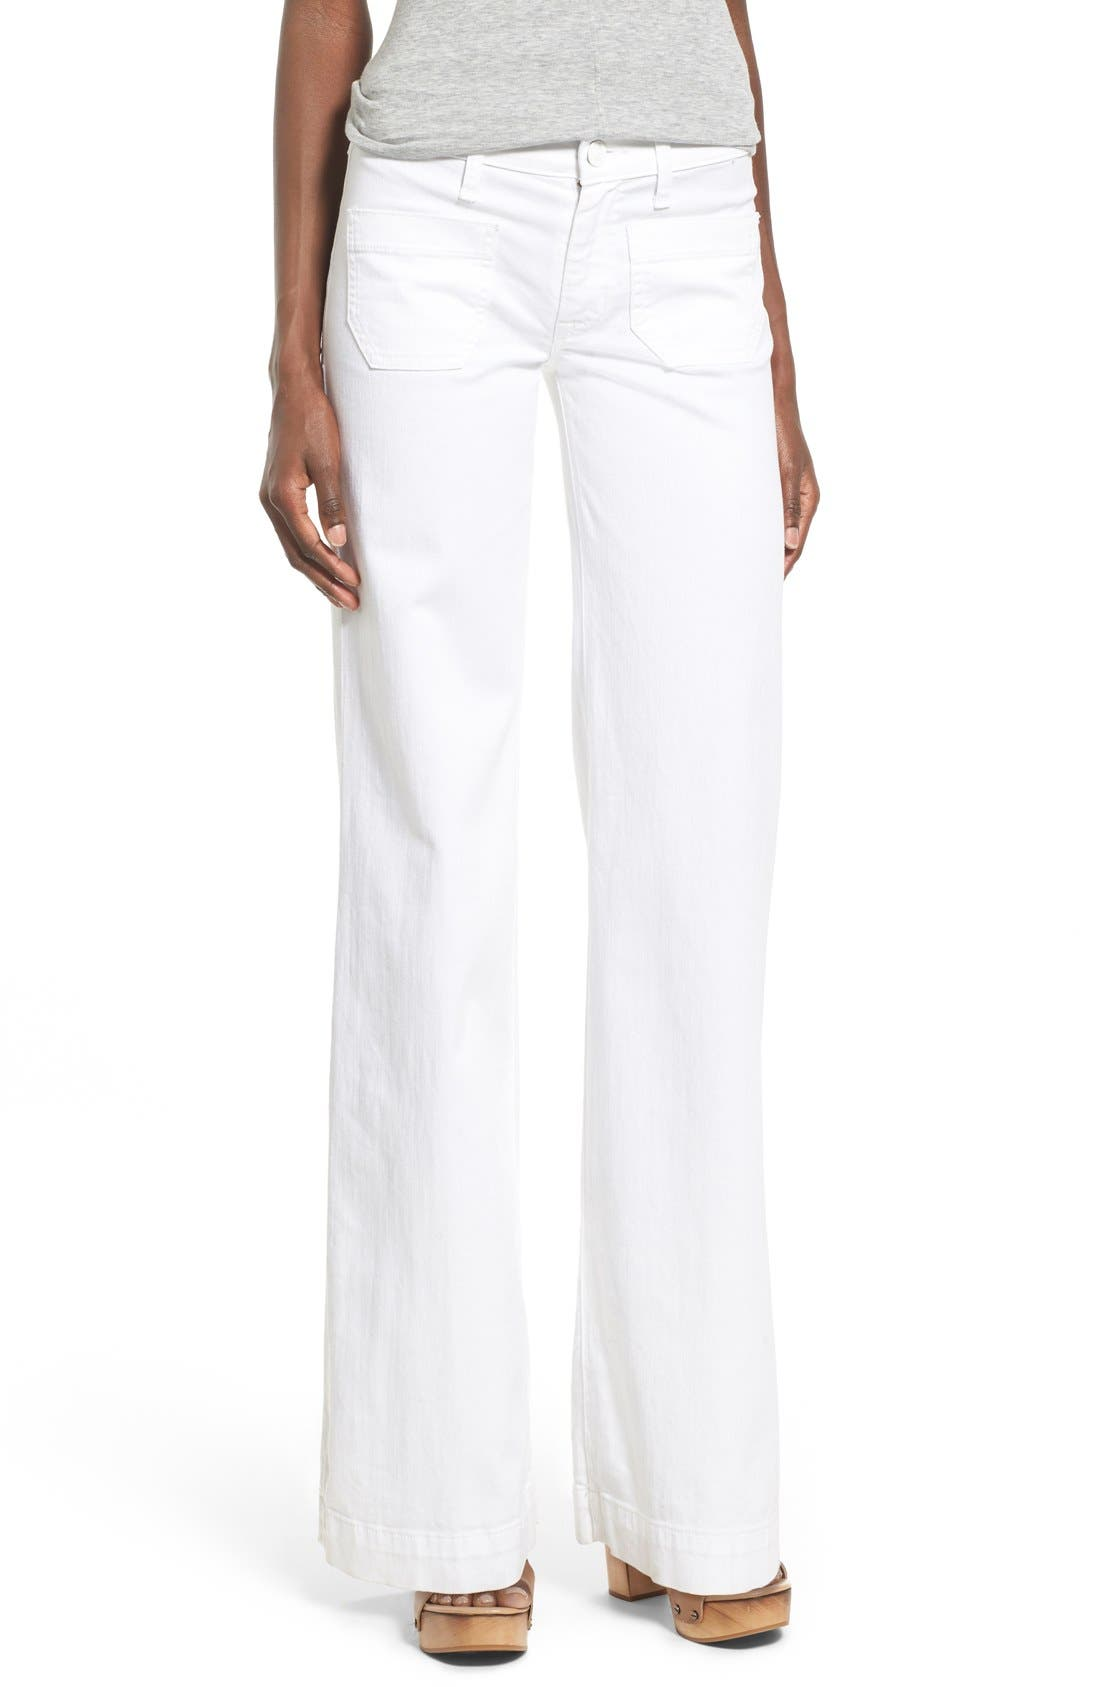 Main Image - Hudson Jeans 'Libby' Wide Leg Sailor Jeans (White 2)